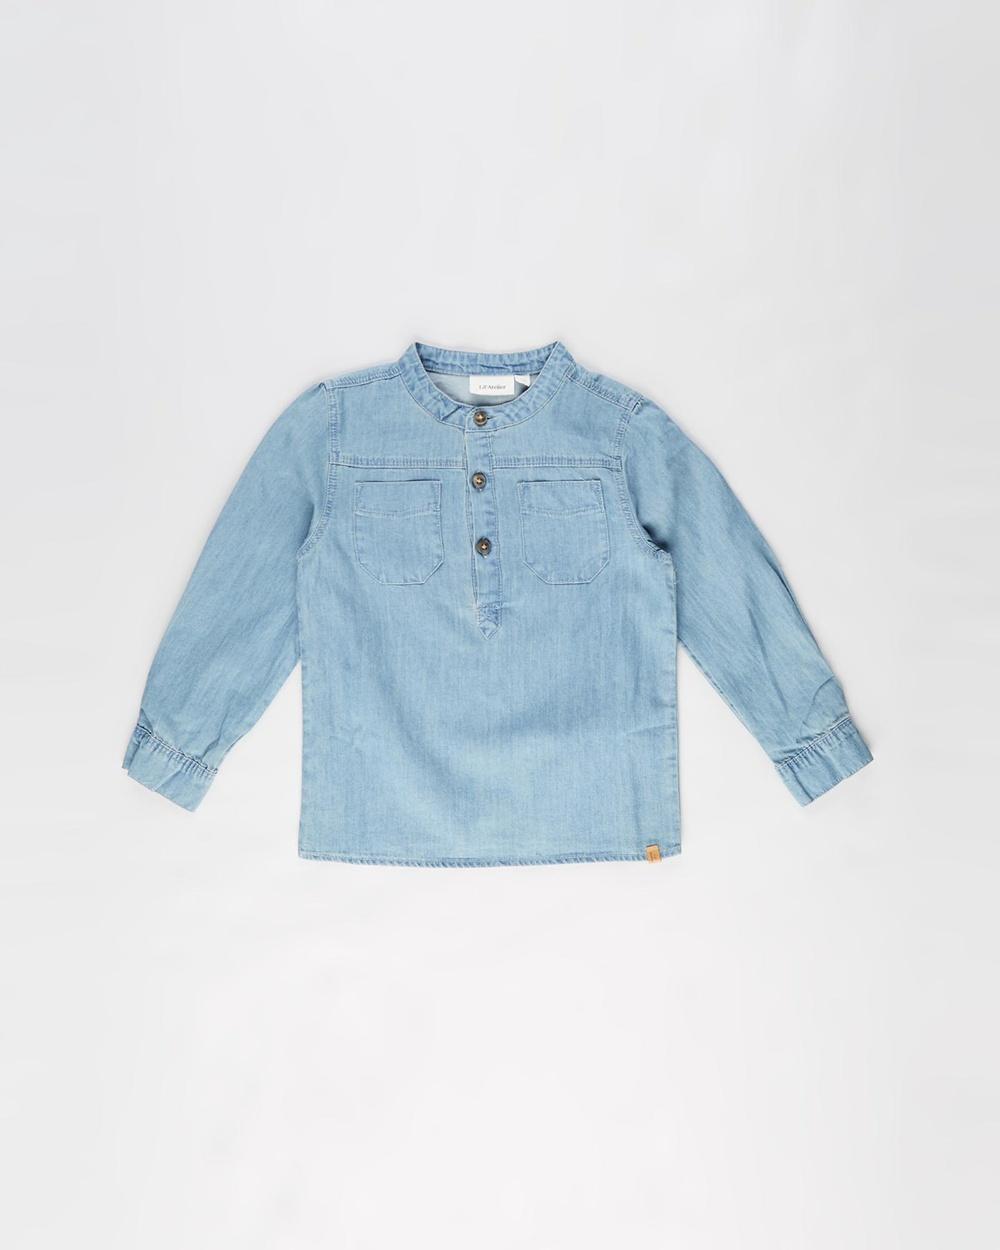 Lil?ÇÖ Atelier Milan Denim Long Sleeve Shirt Kids Tops Light Blue Denim Australia